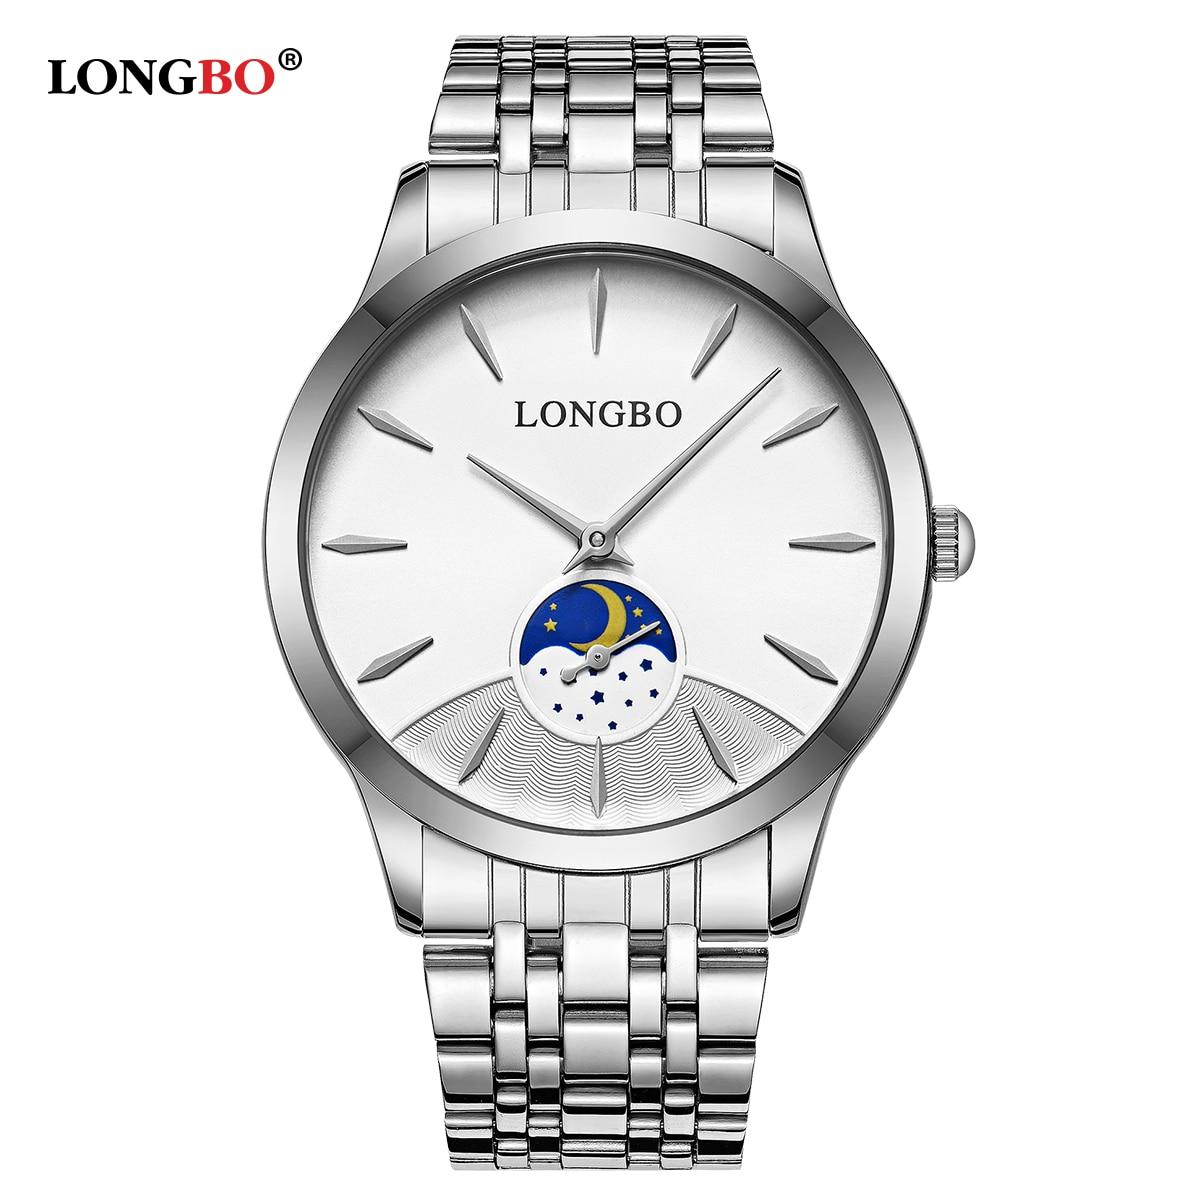 Fashion New LONGBO Brand Waterproof Lovers Watch Fashion Full Stainless Steel Band Simple Men Women Casual Couple Wristwatch